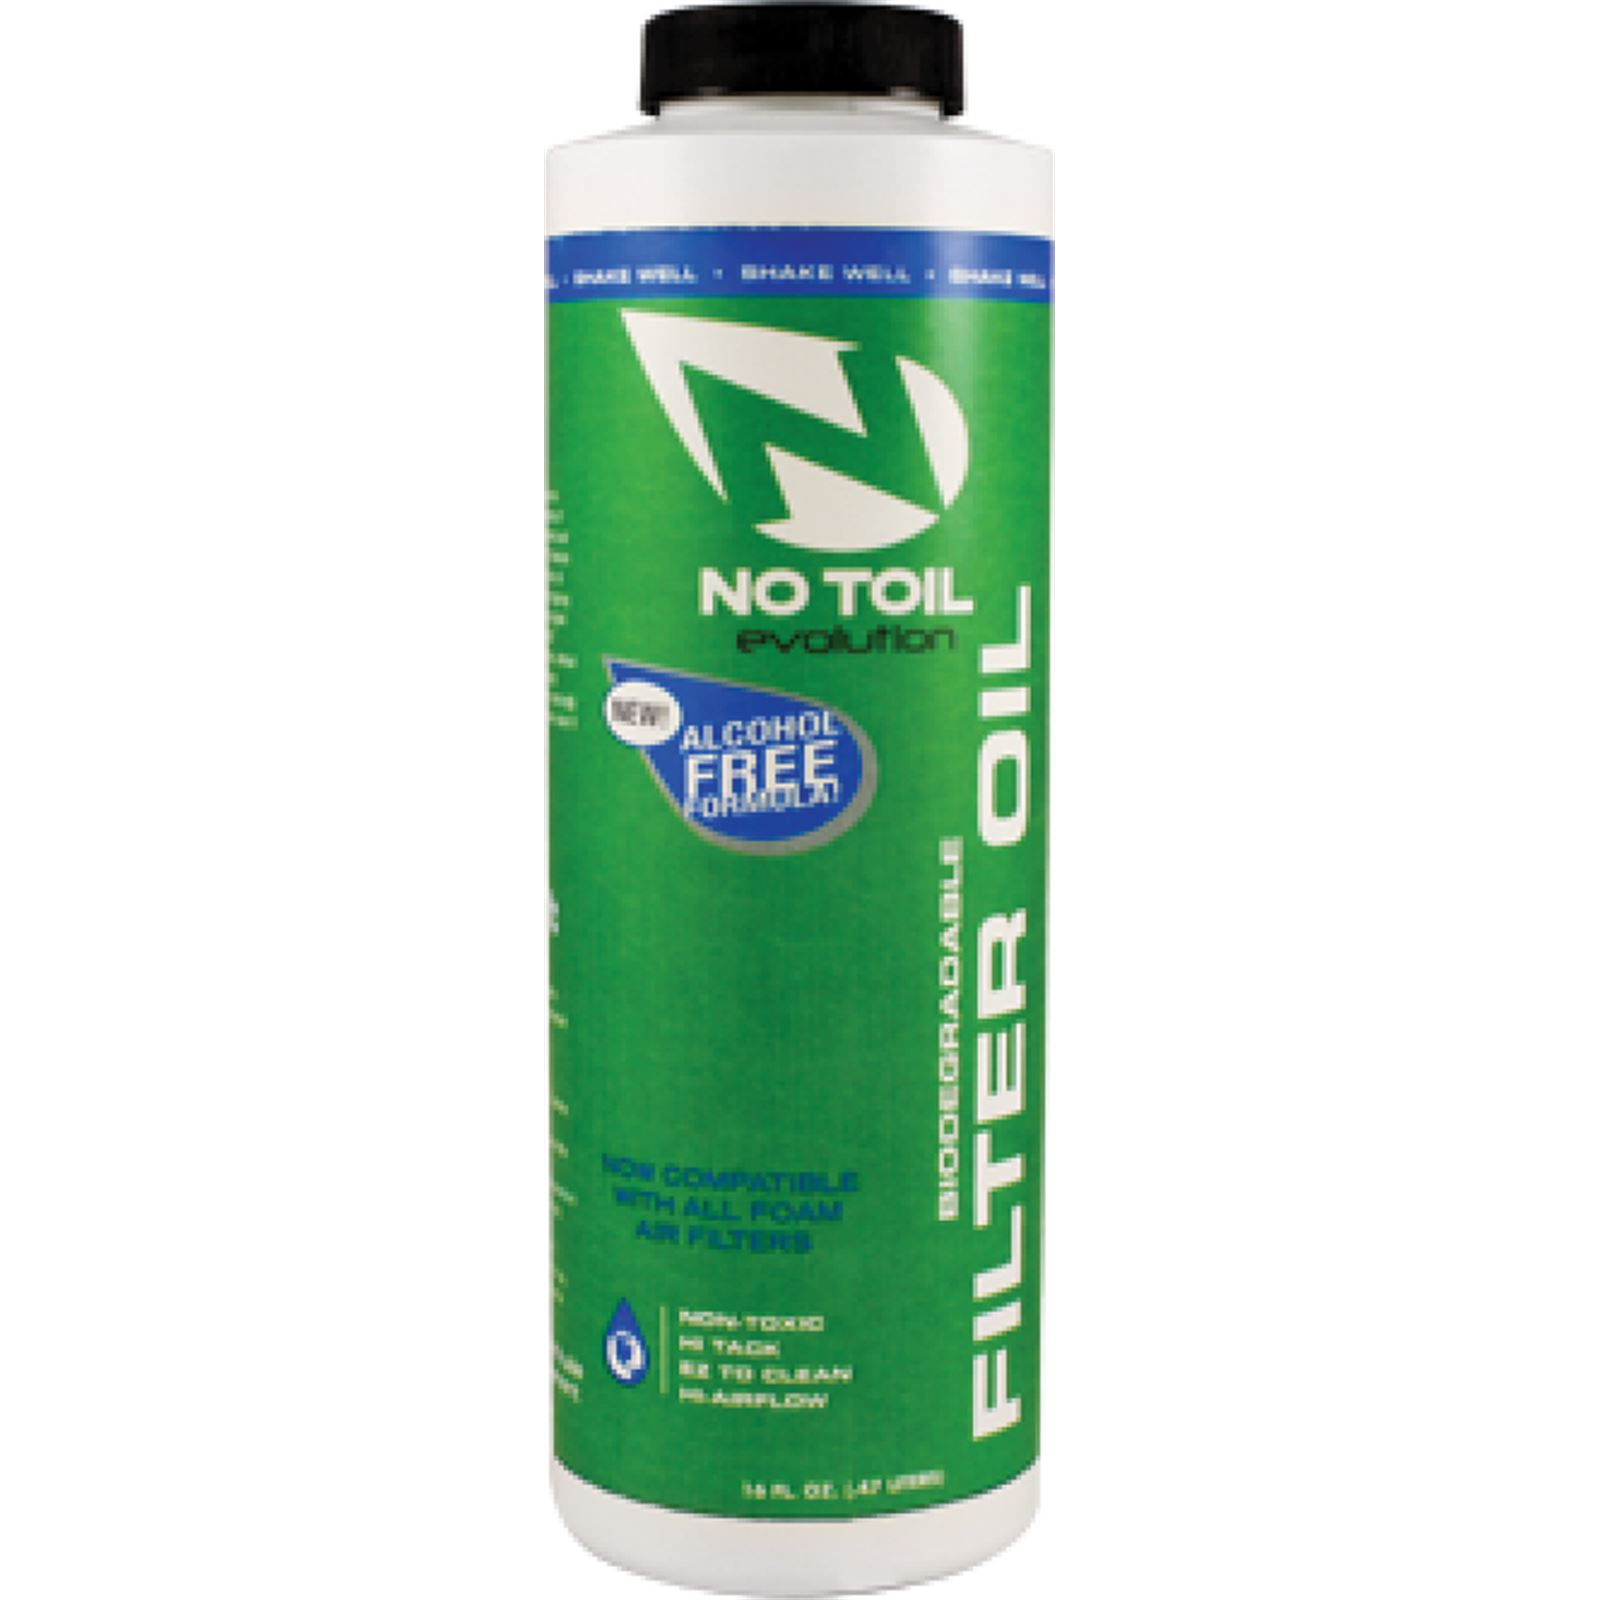 No Toil Evol Filter Oil 16Oz